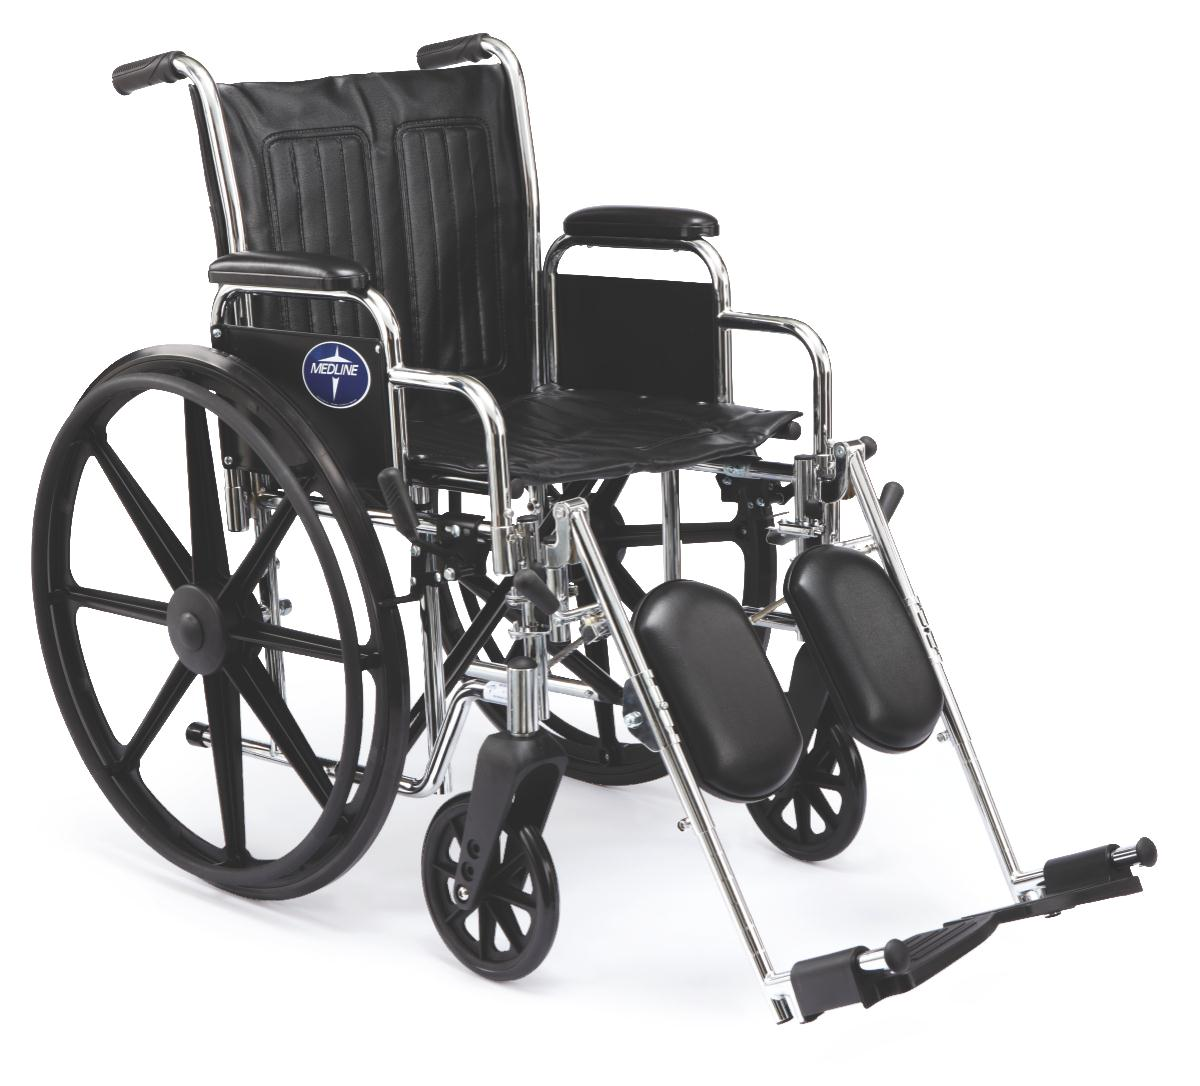 wheelchair manual walmart white plastic chairs medline parts all brands